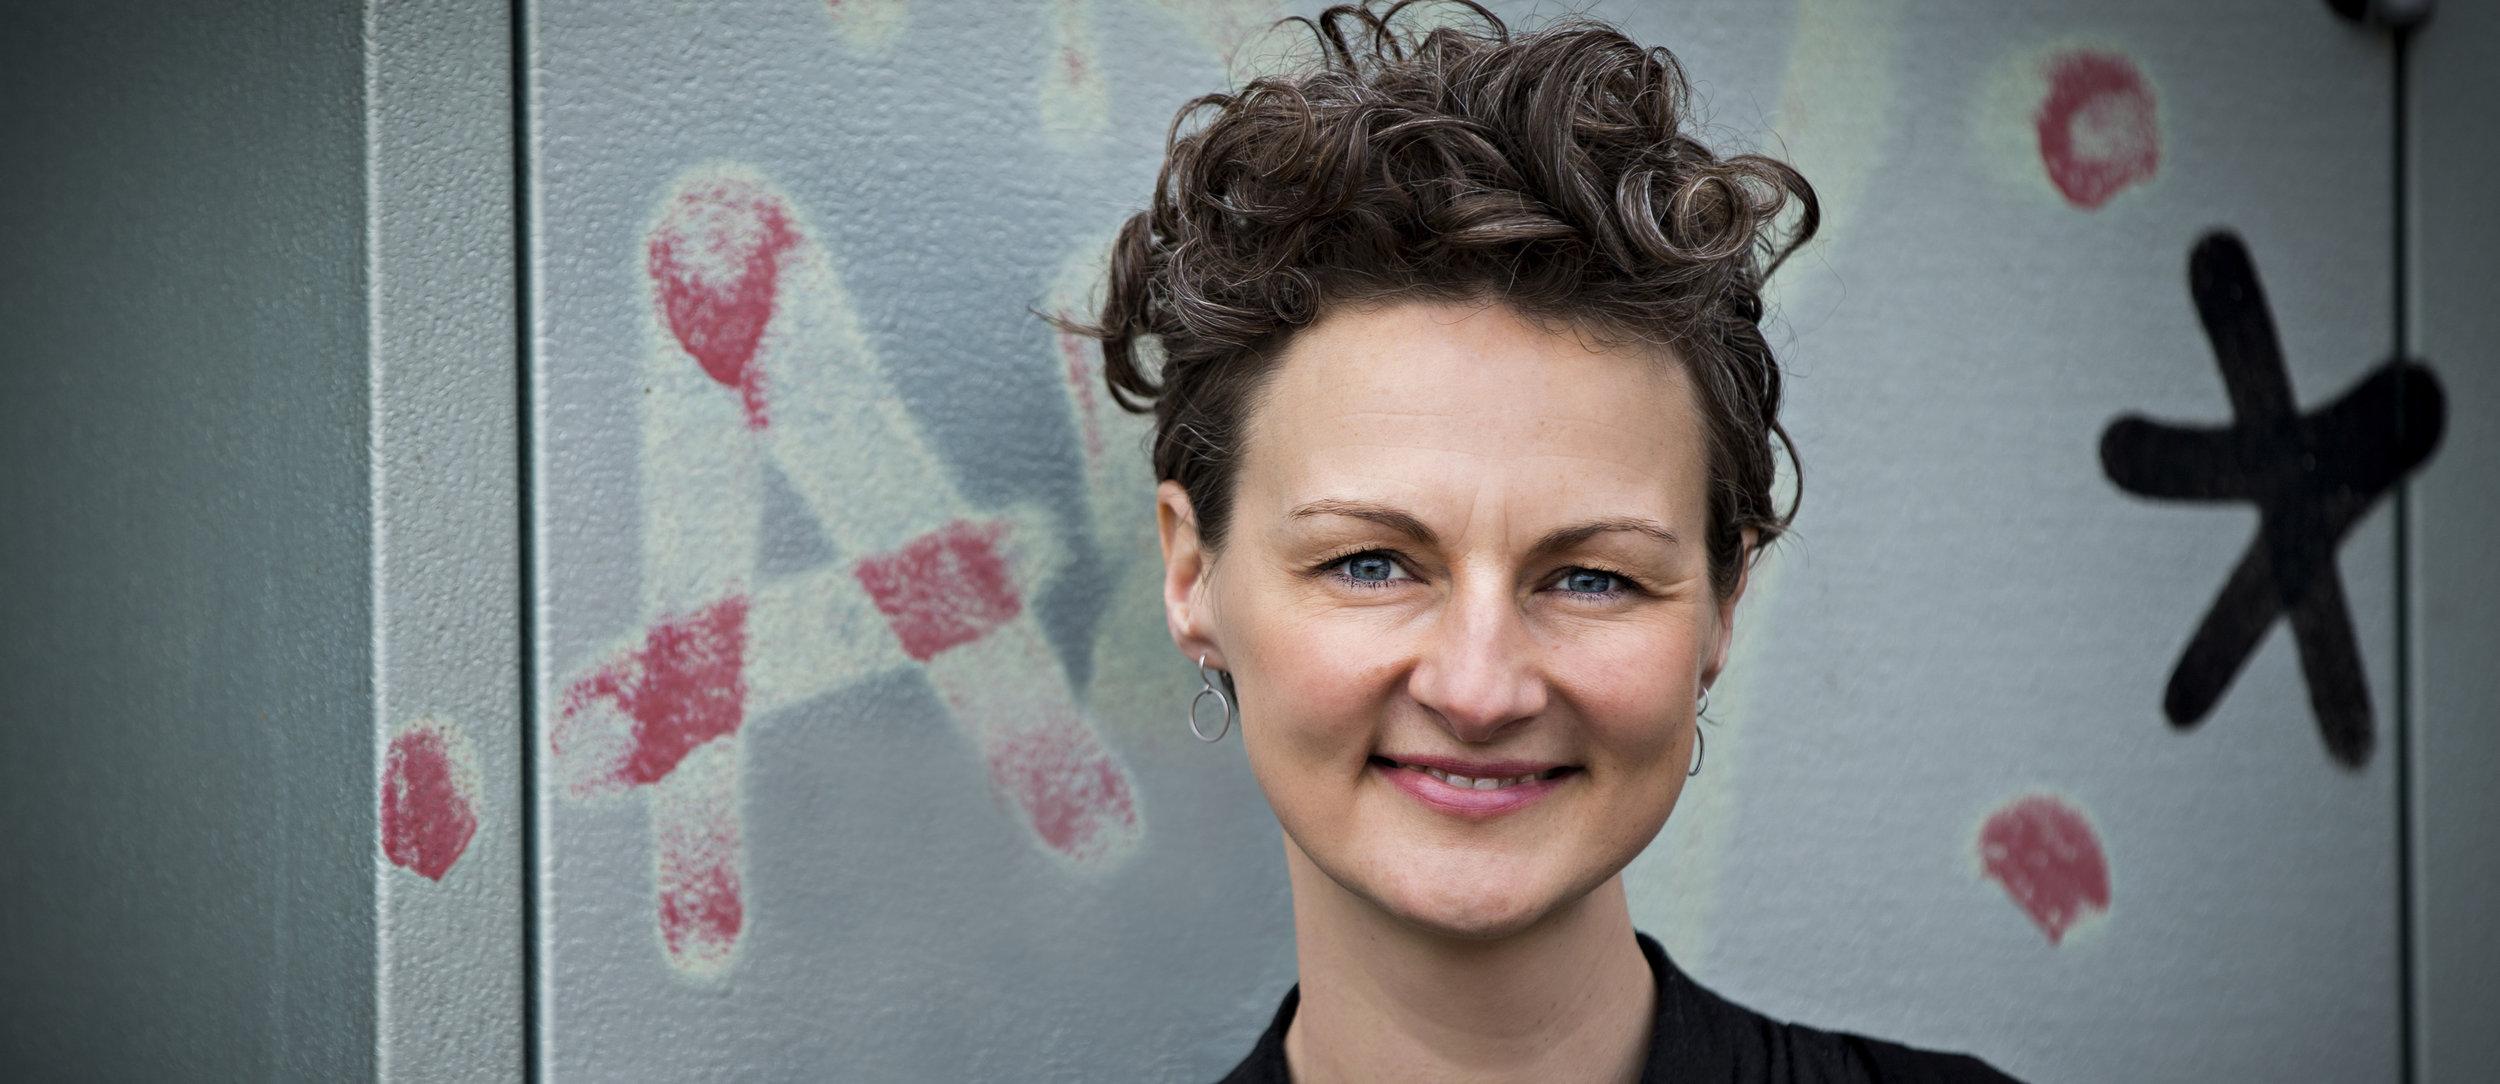 Laura Vilsbaek - Laura_39 - fotograf Inge Lyngaard Hansen.jpg